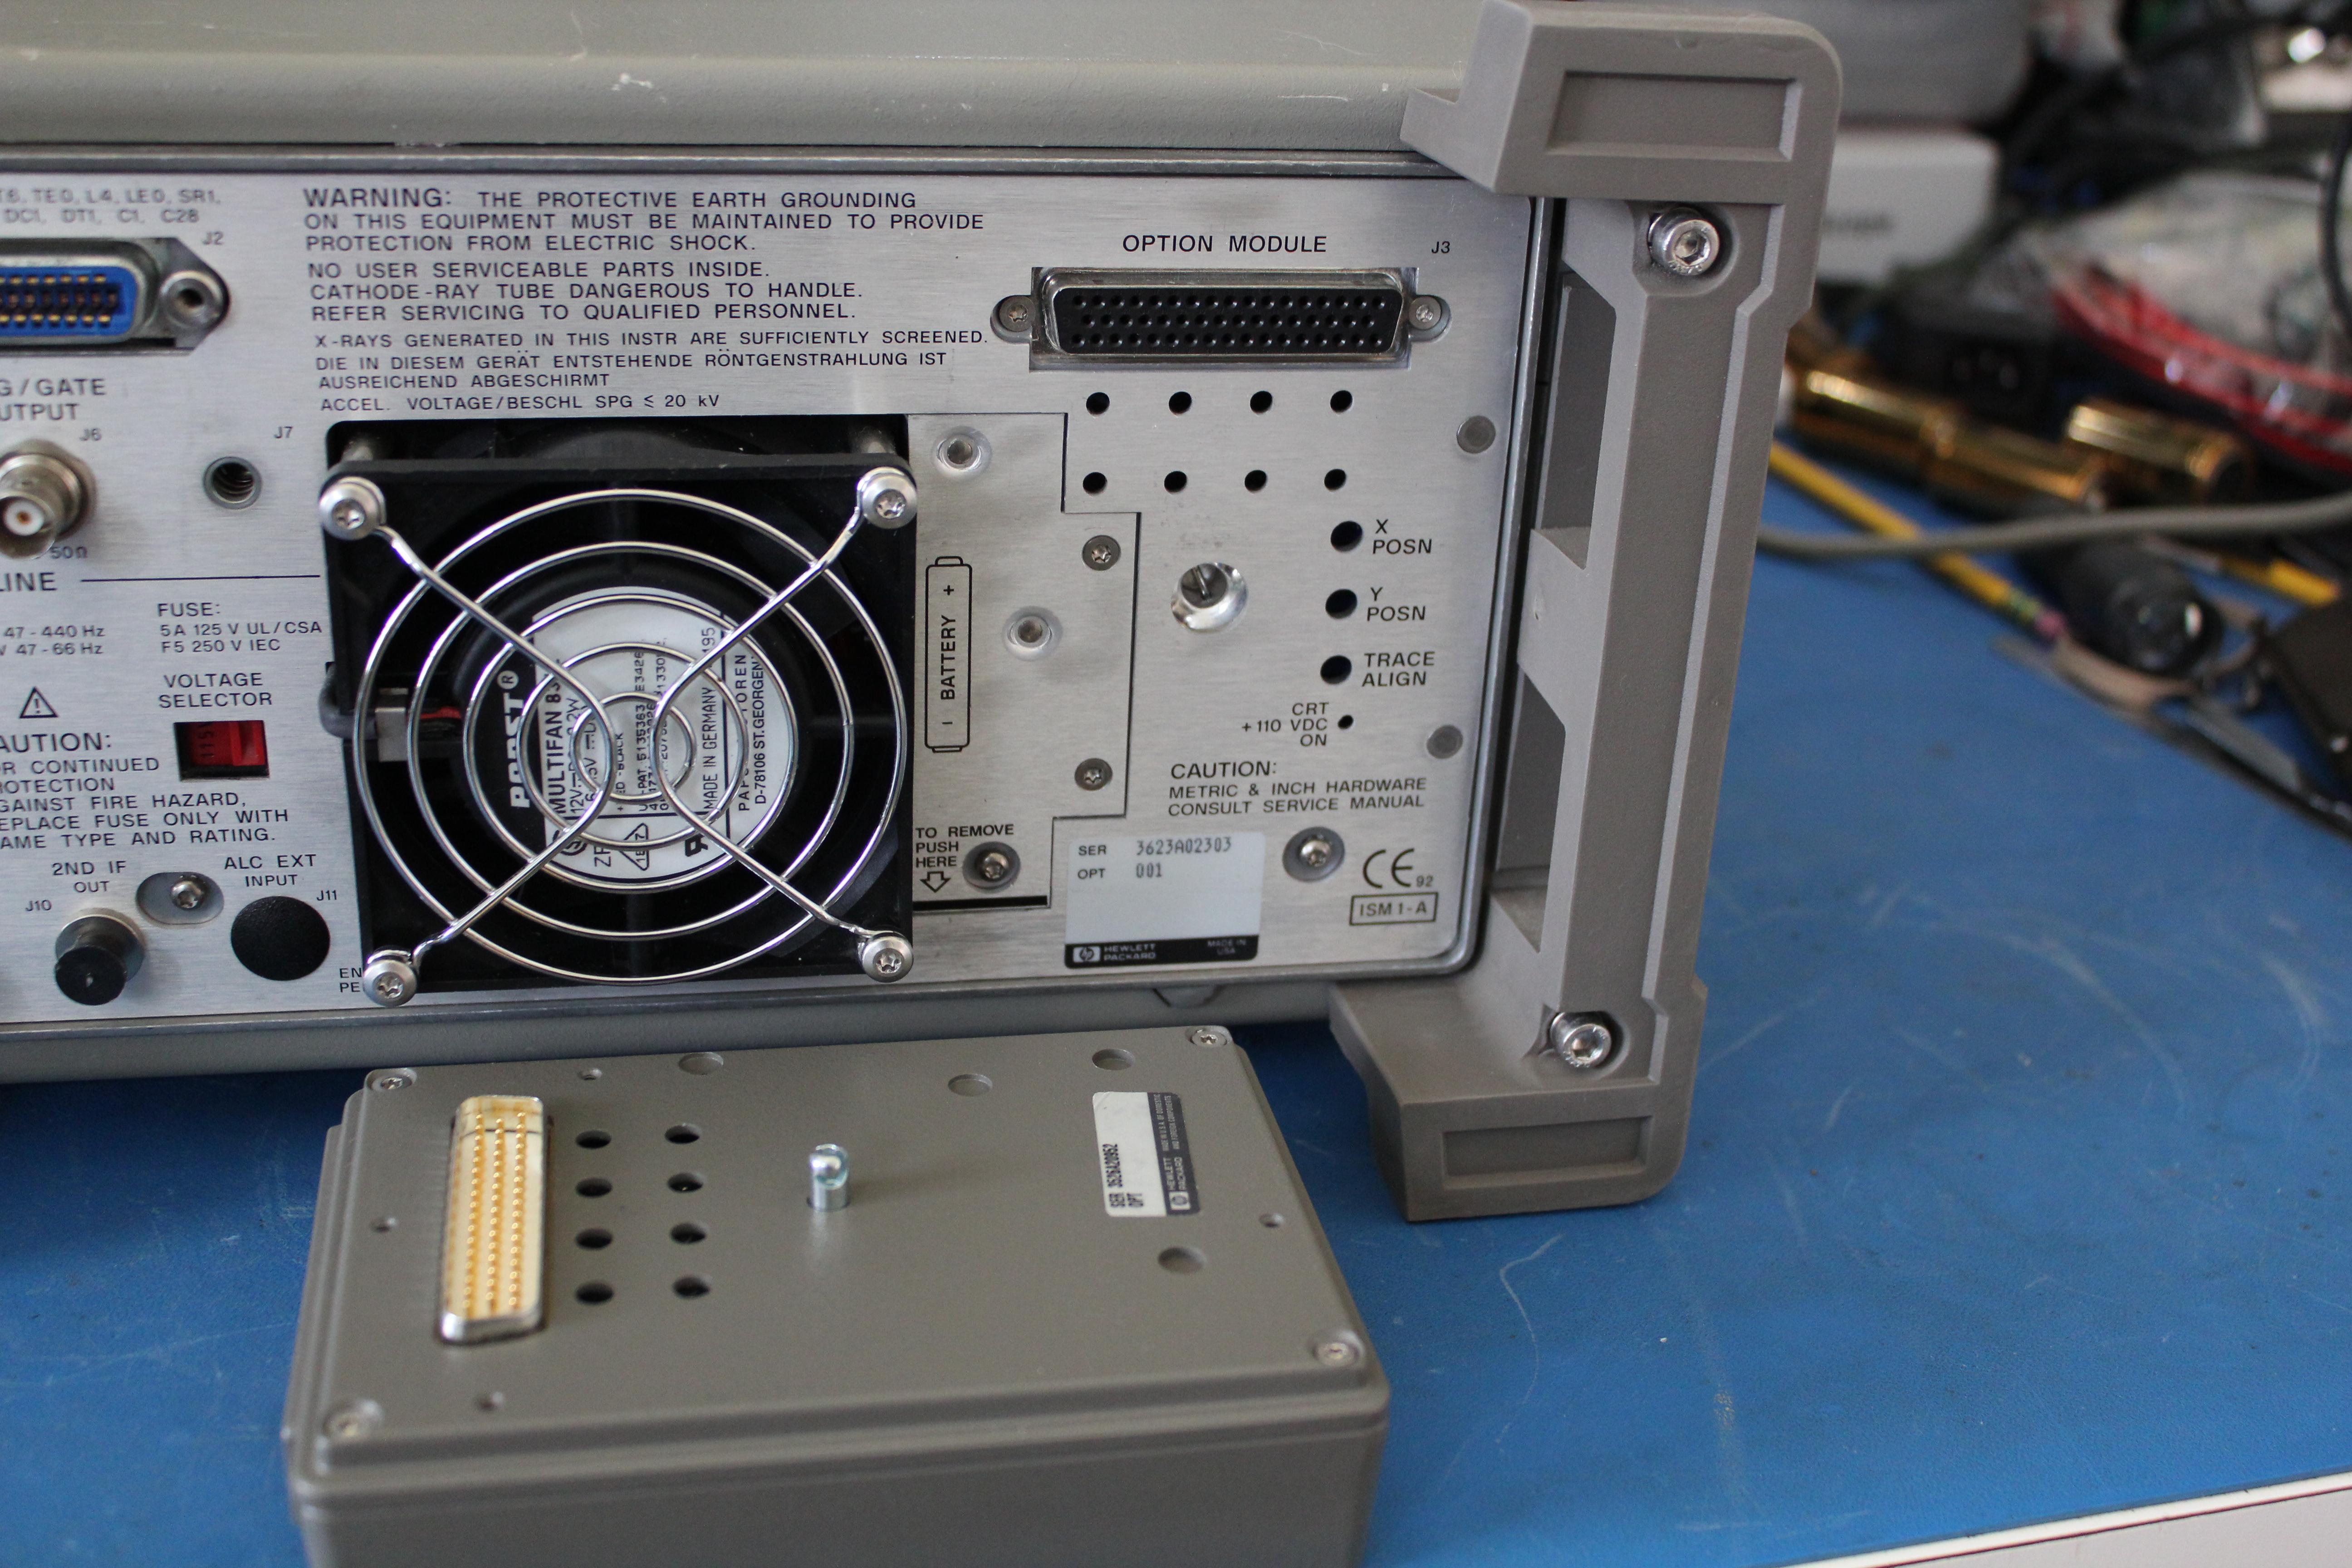 Mass storage module removed